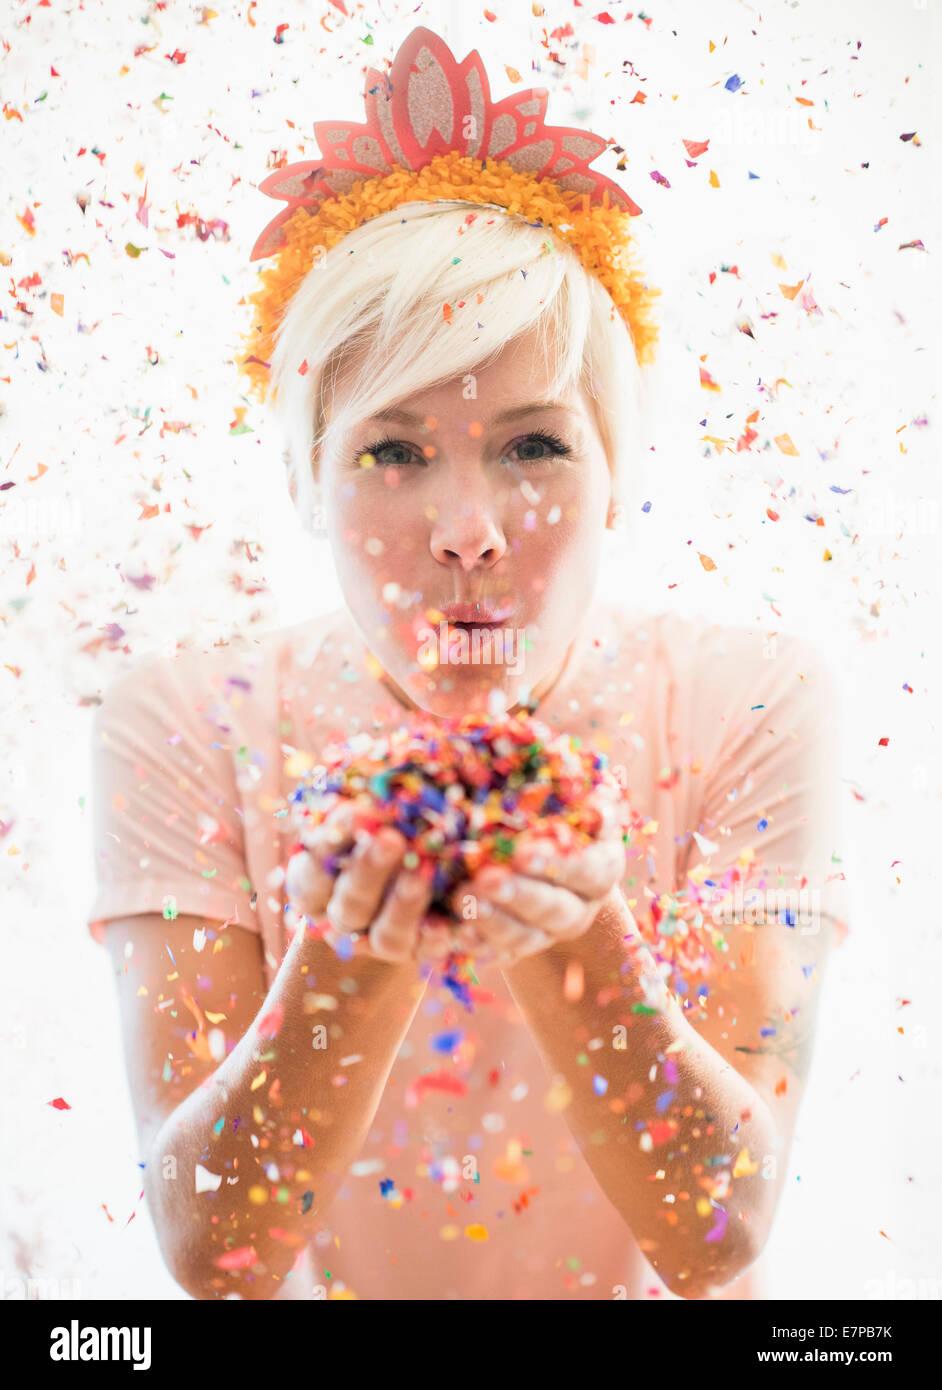 Woman wearing tiara blowing confetti - Stock Image